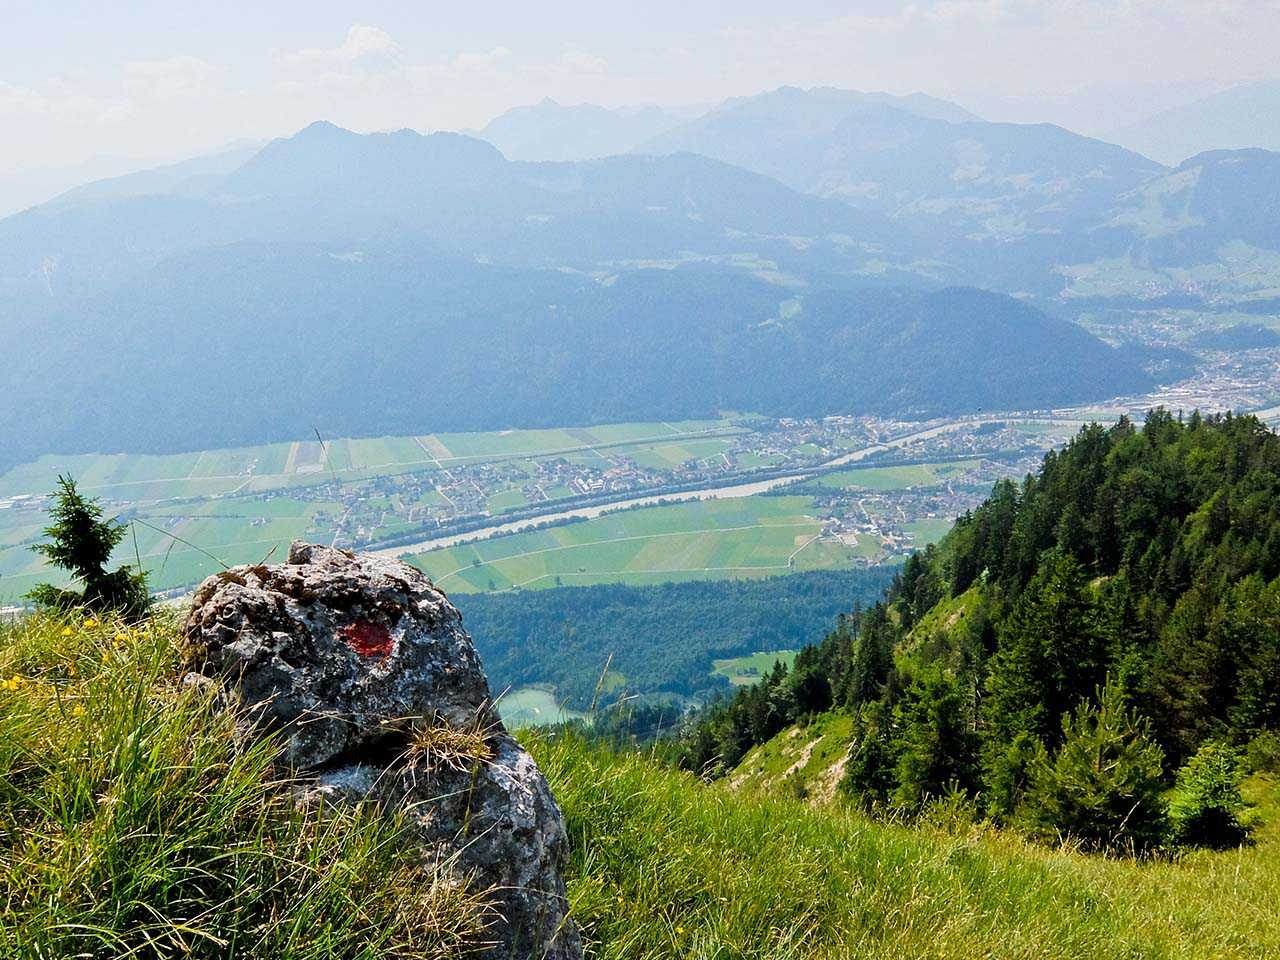 Brandenberg Alps, Tyrol - Kramsach and River Inn